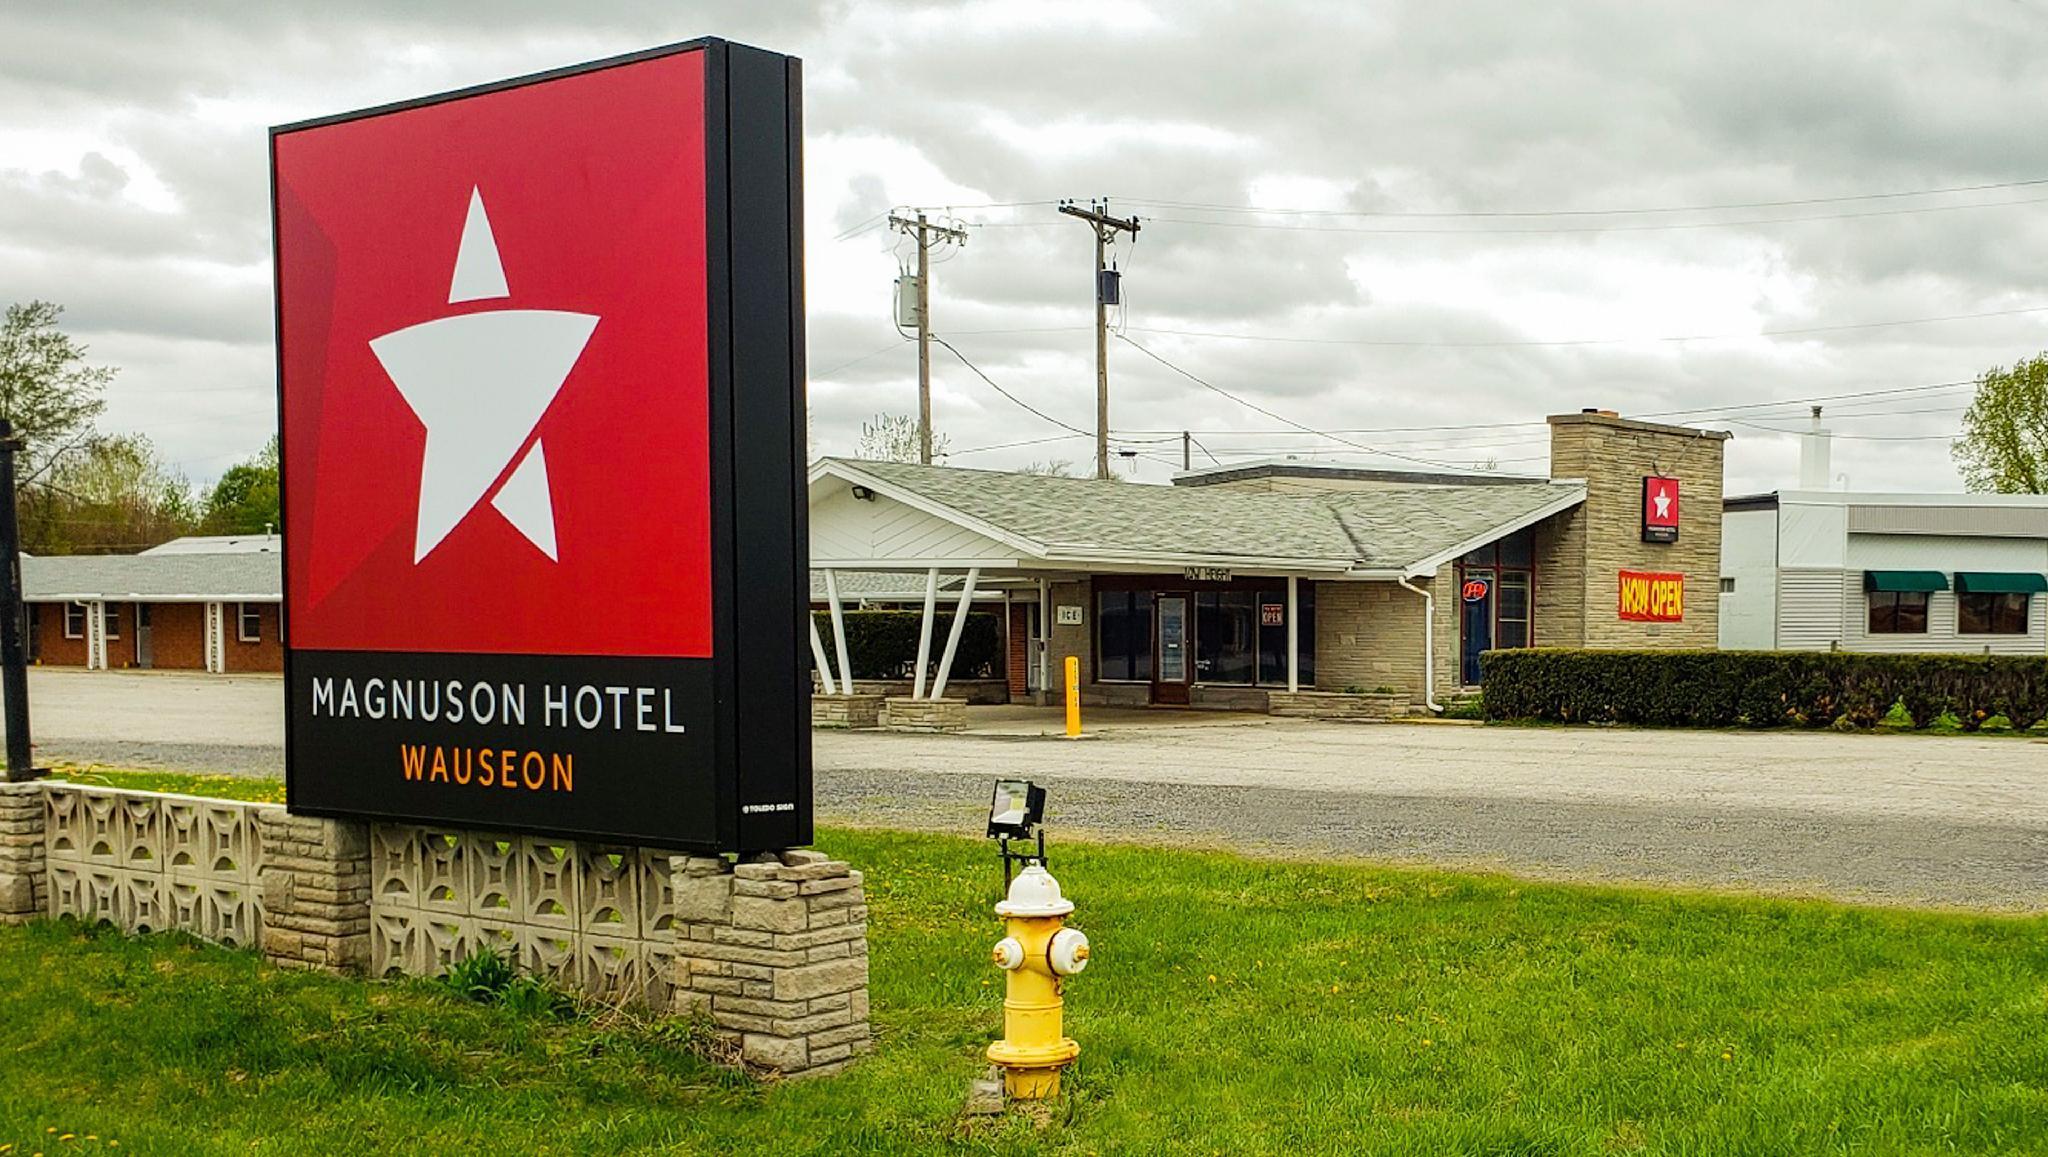 Magnuson Hotel Wauseon